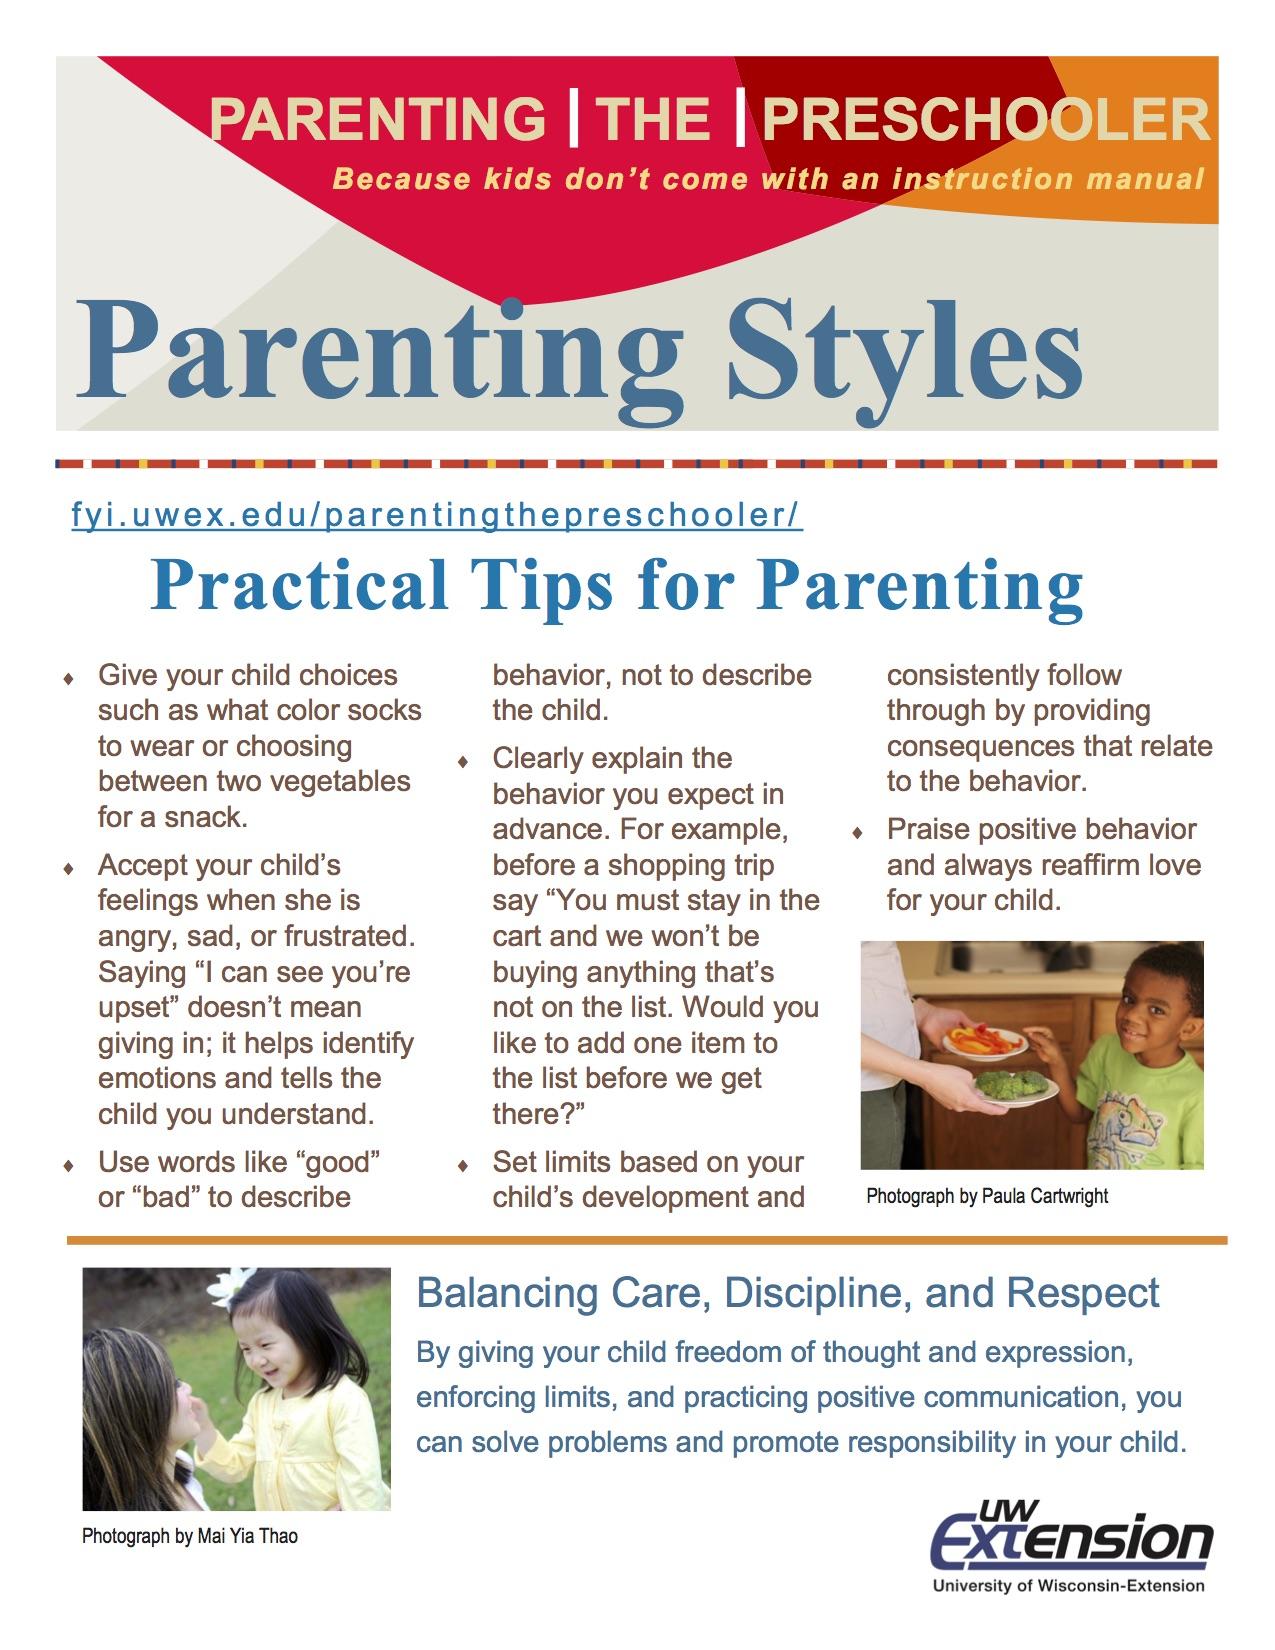 PtP-Parenting-Styles